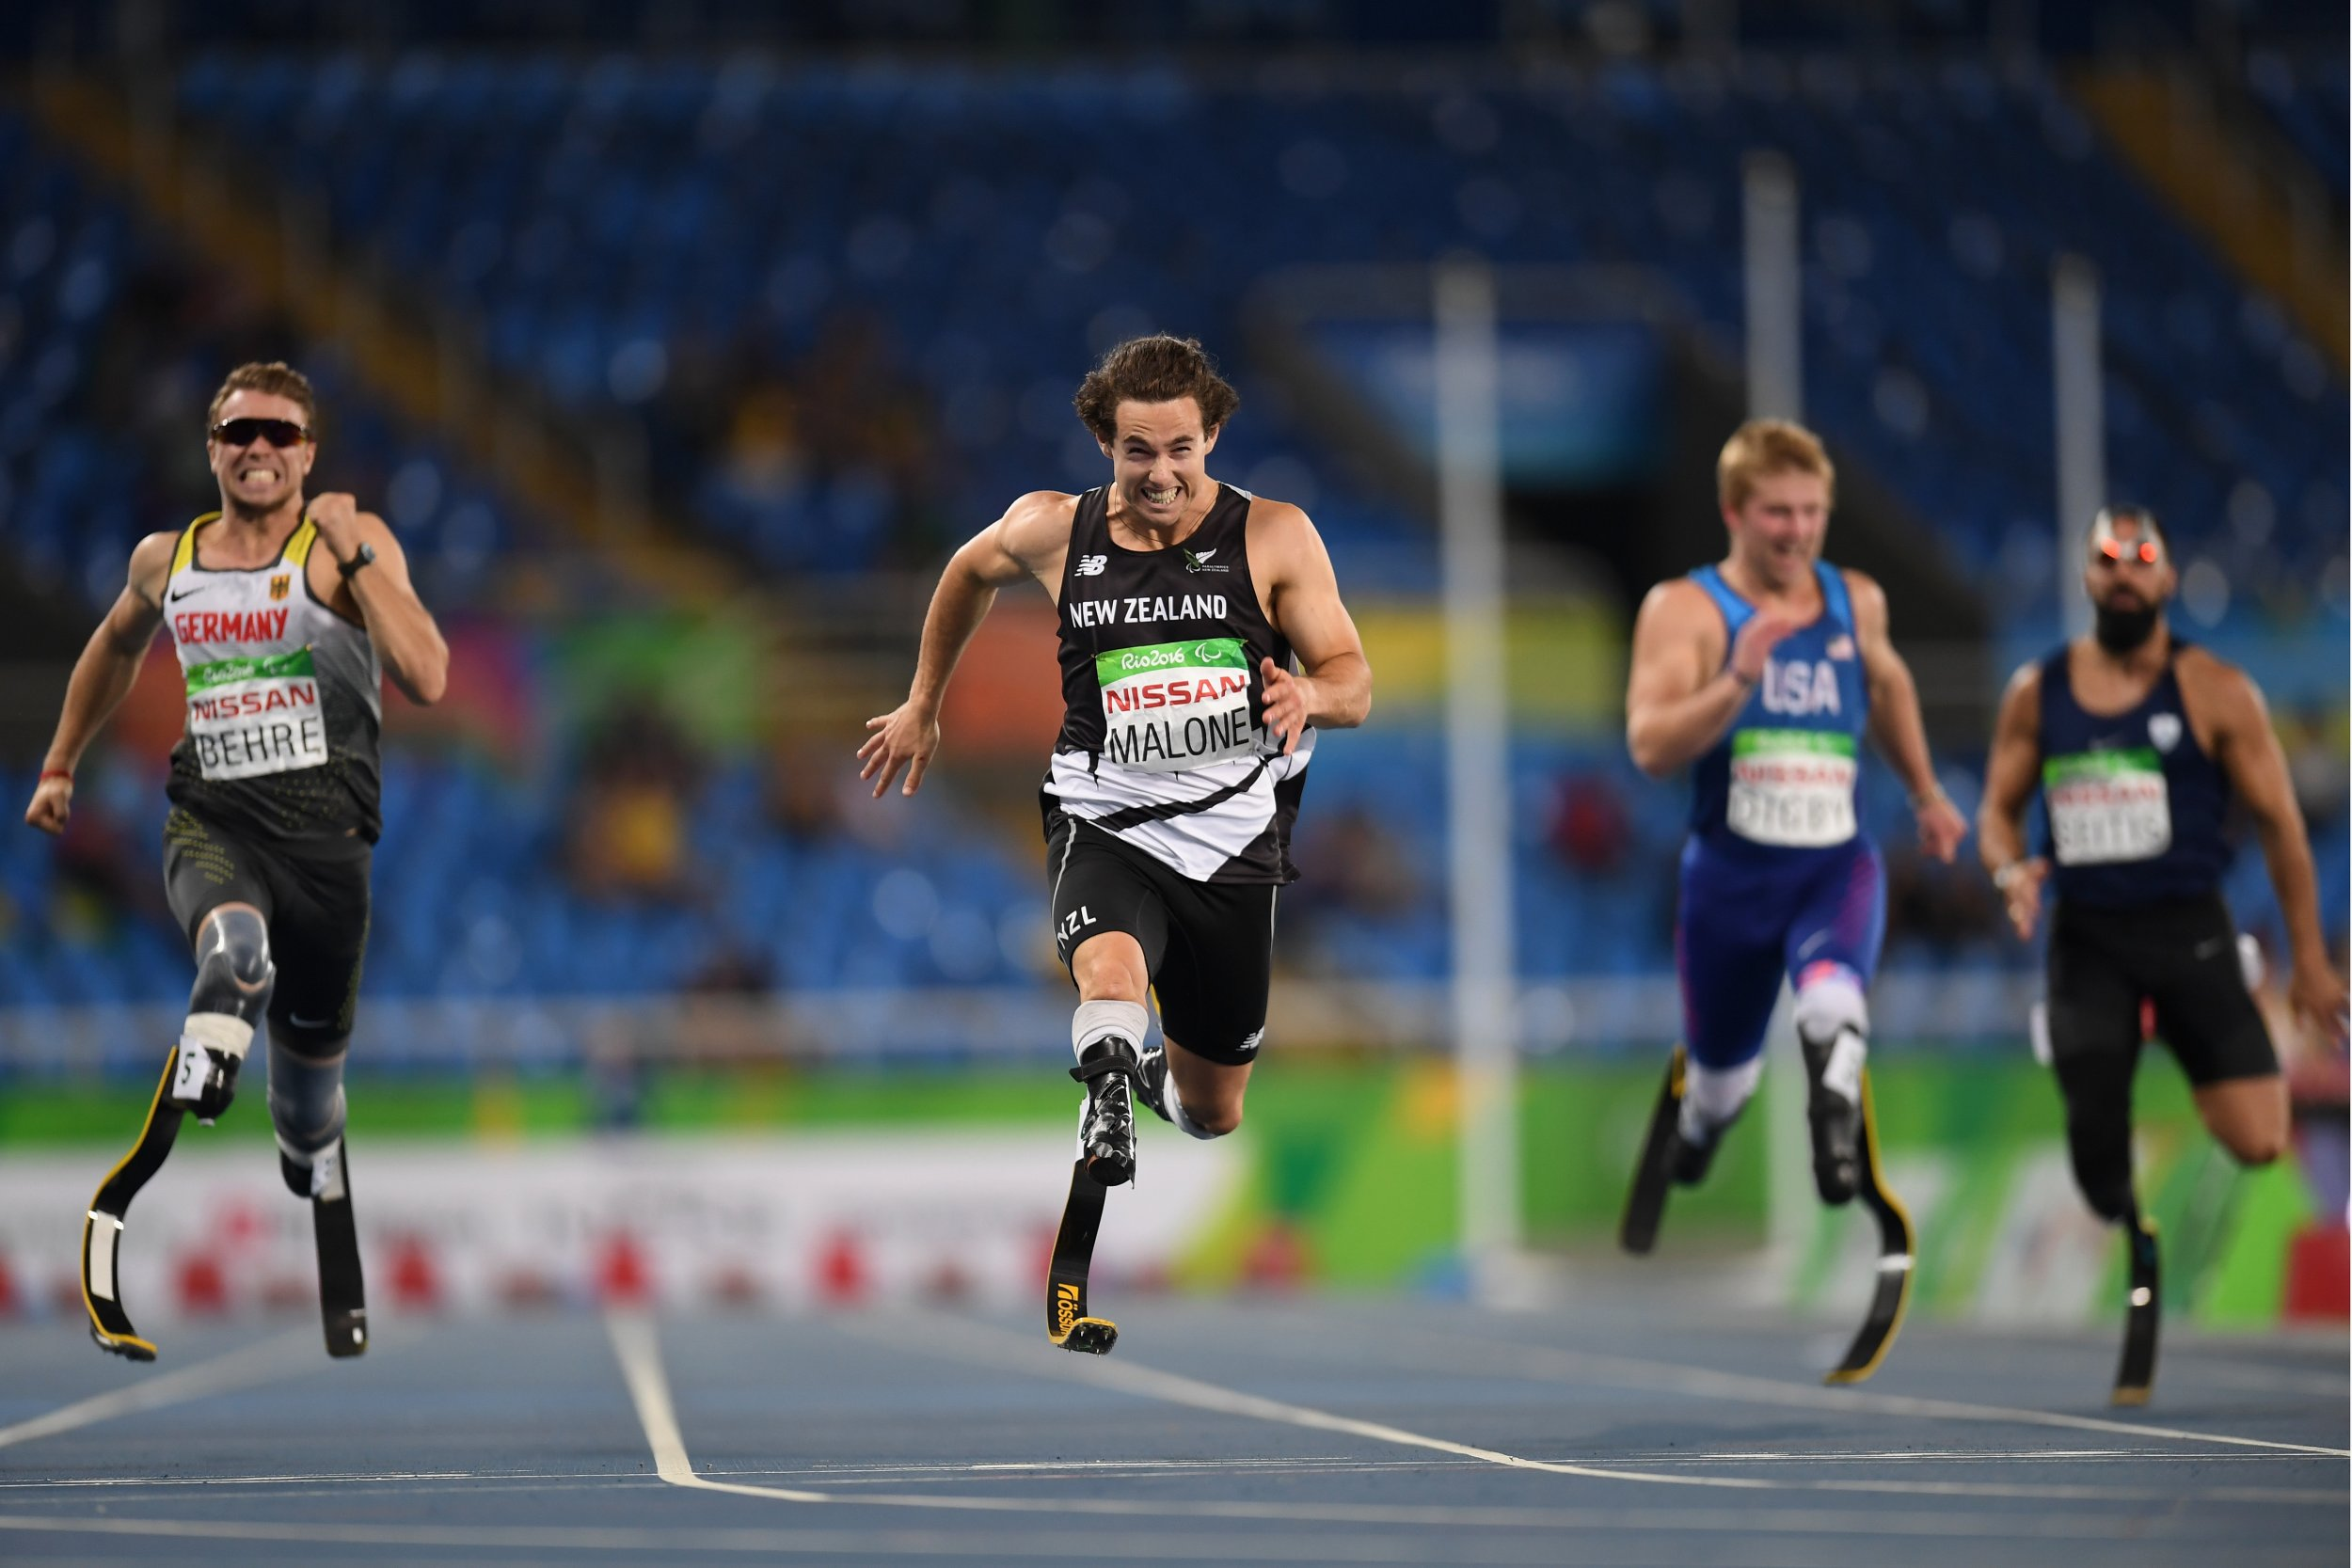 New Zealand Paralympian Liam Malone, center.